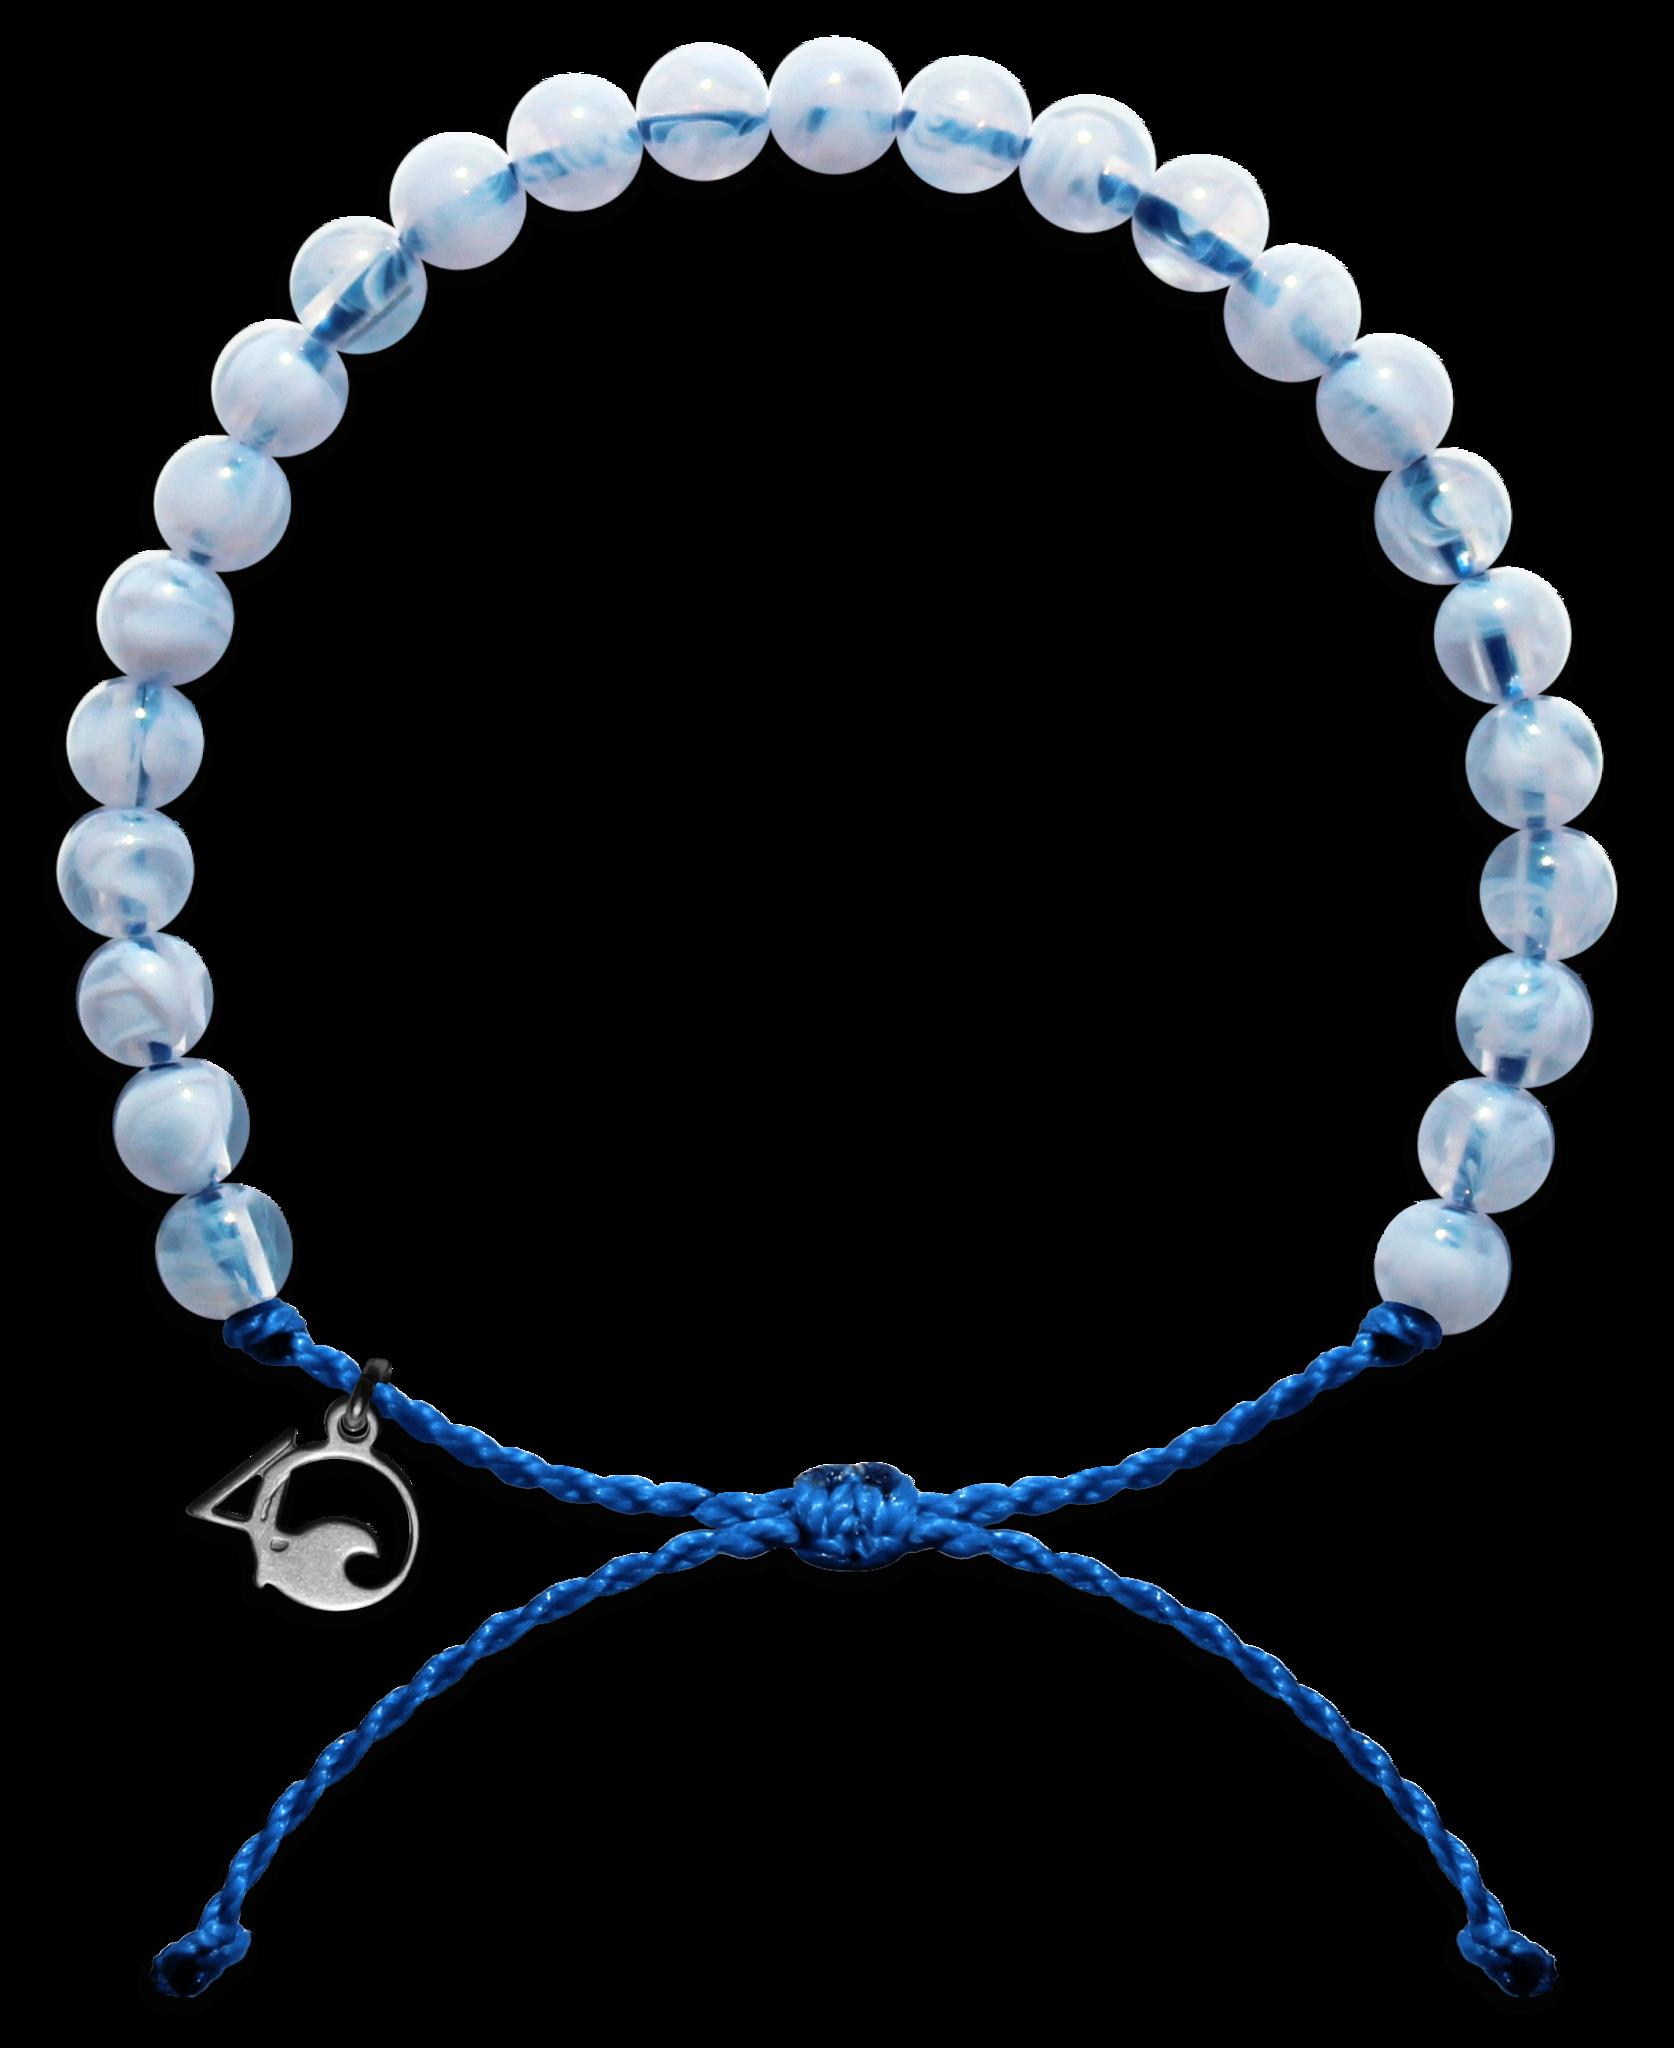 The 4ocean Bracelet | Averi fun to make | Recycled ...